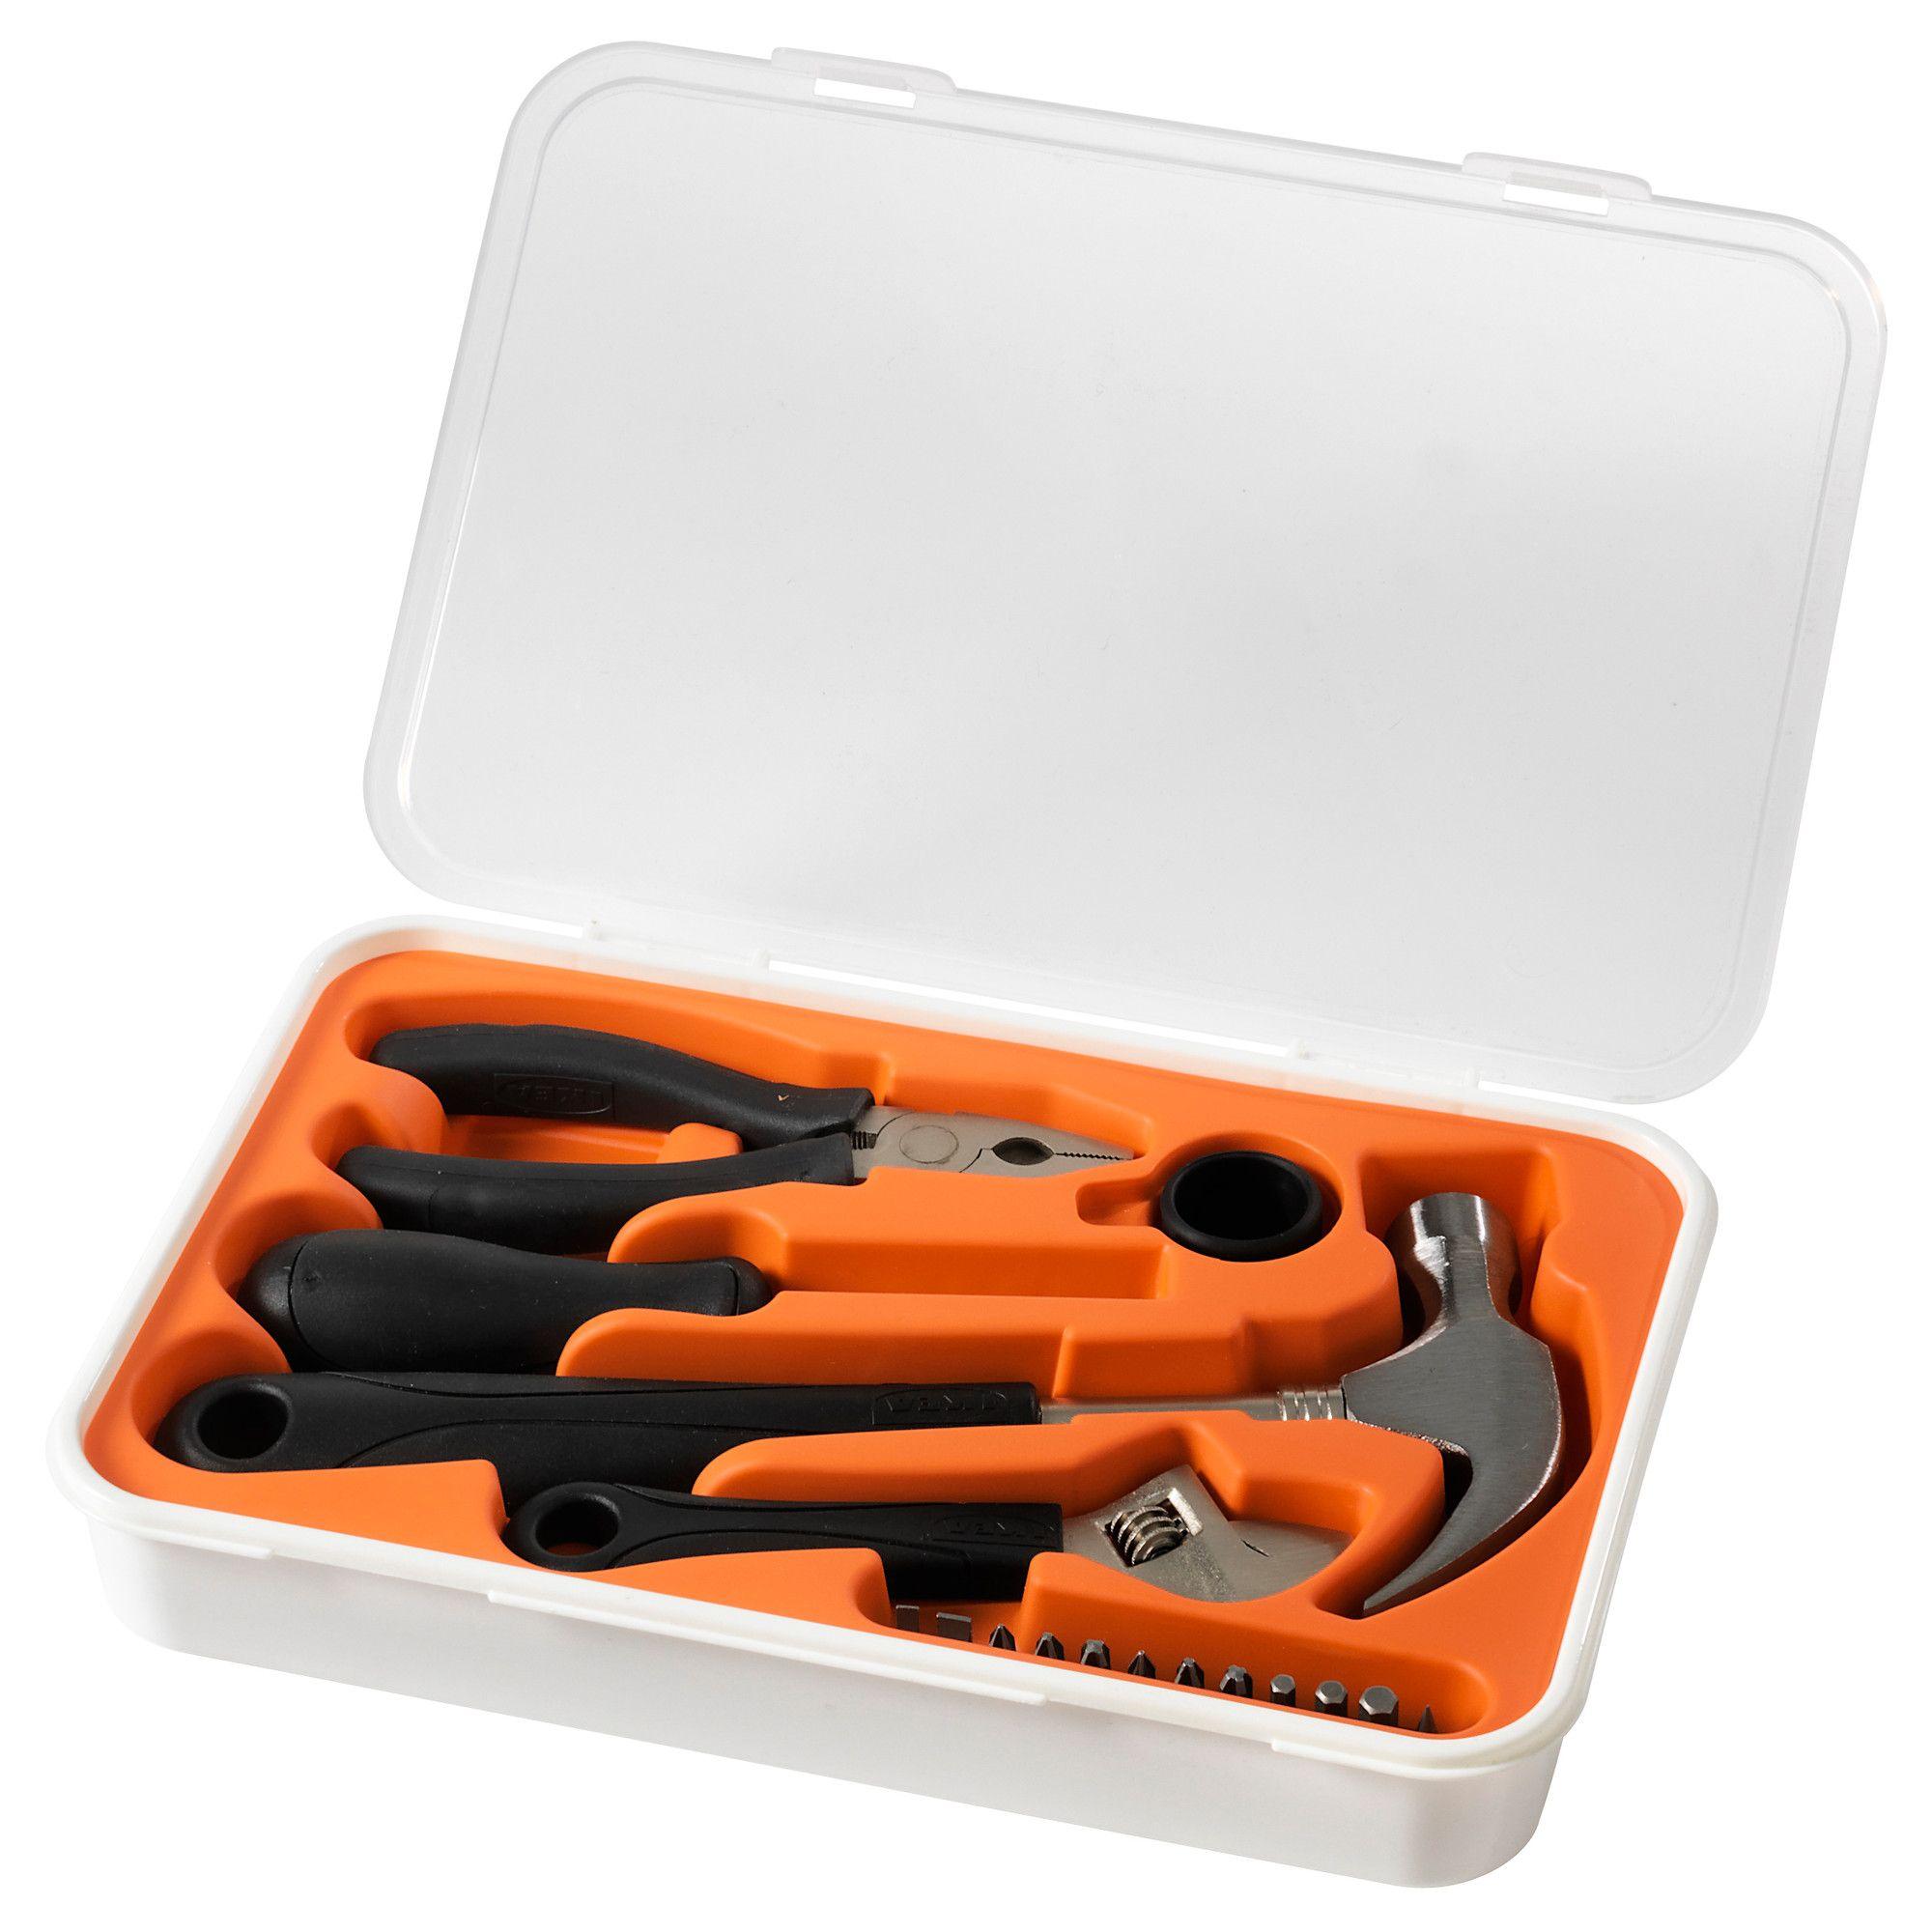 FIXA 17-piece tool kit | Tool kit, Apt ideas and Apartments